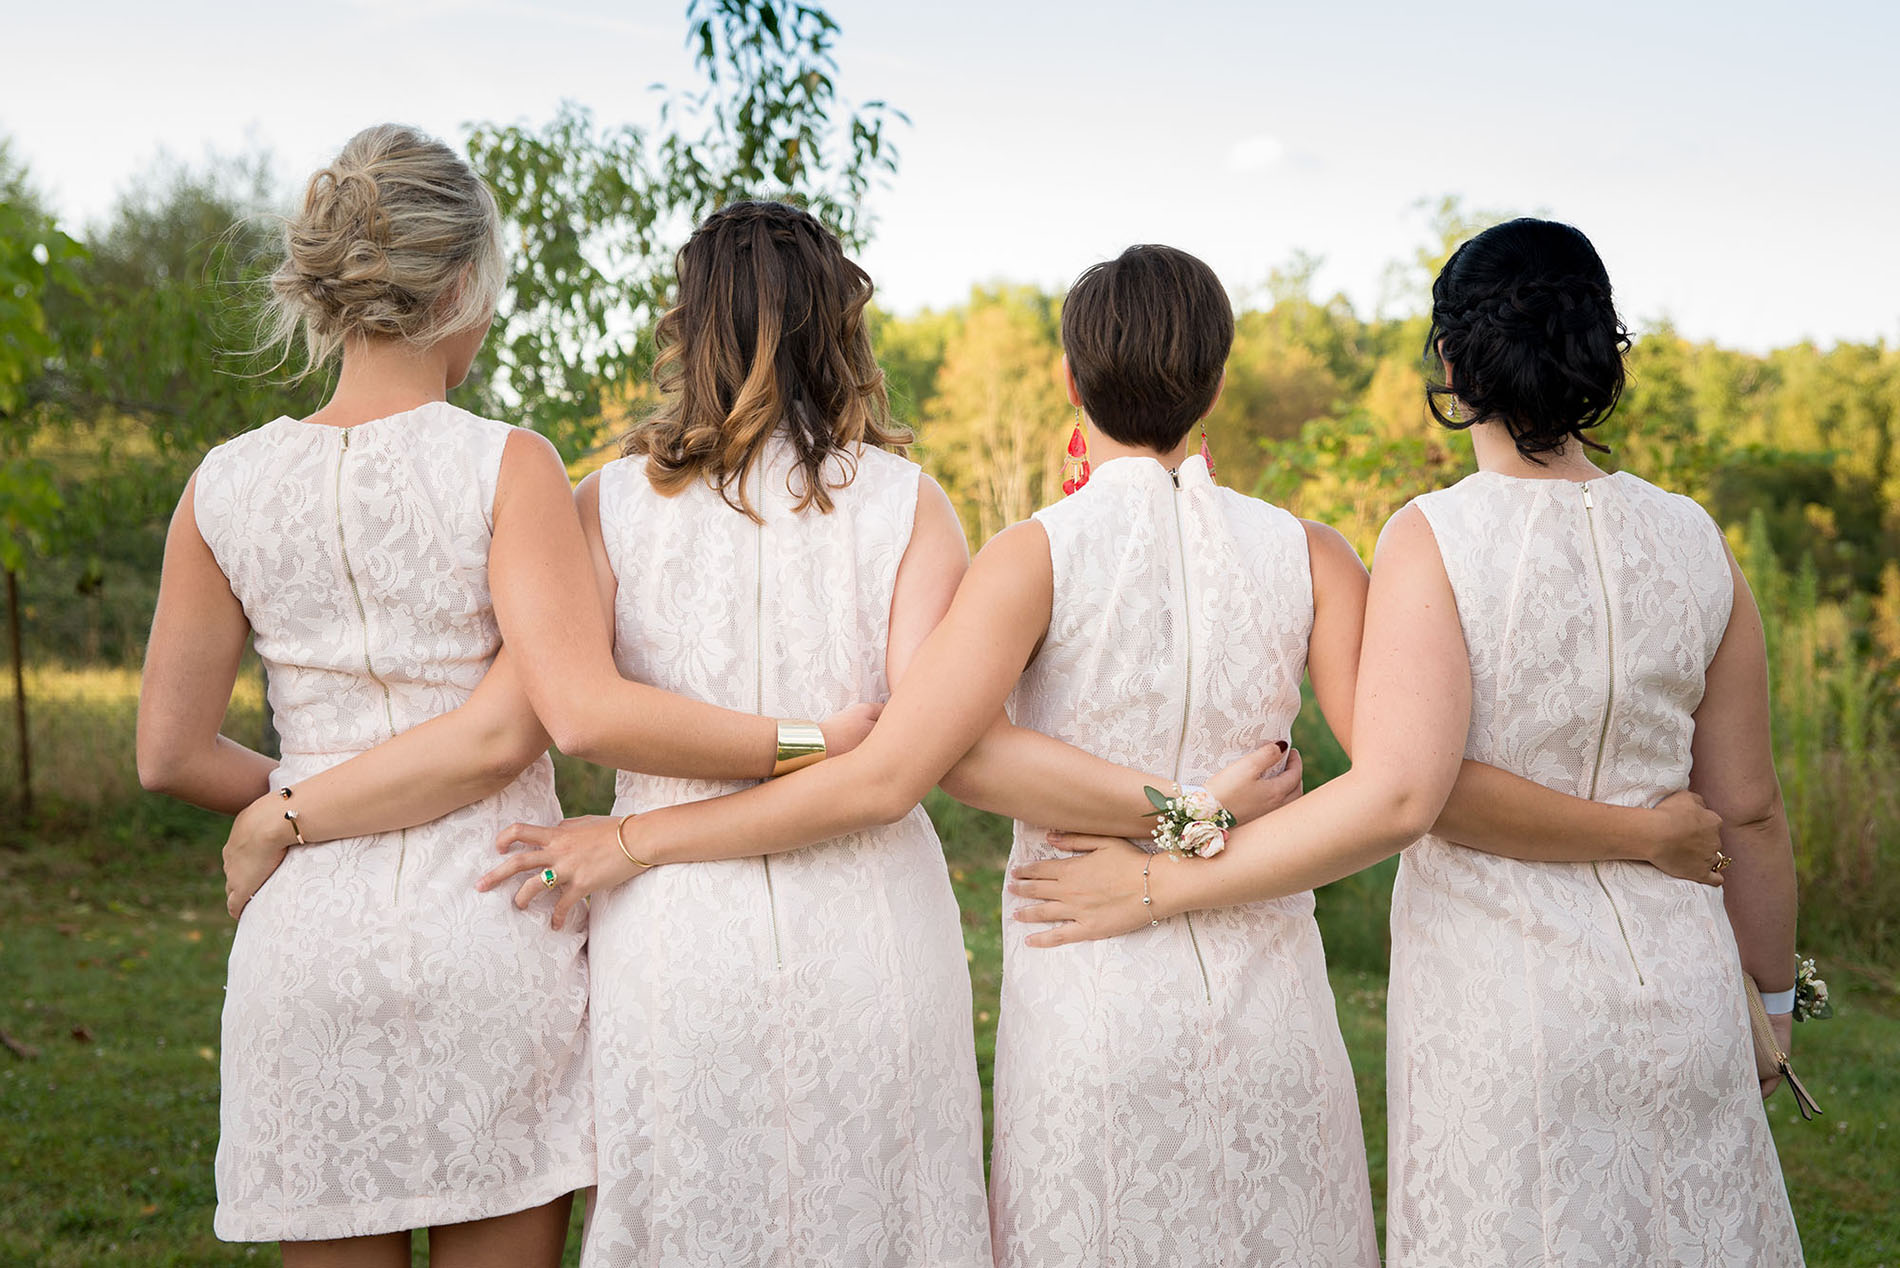 Photographe mariage limoges 3 - Mariages